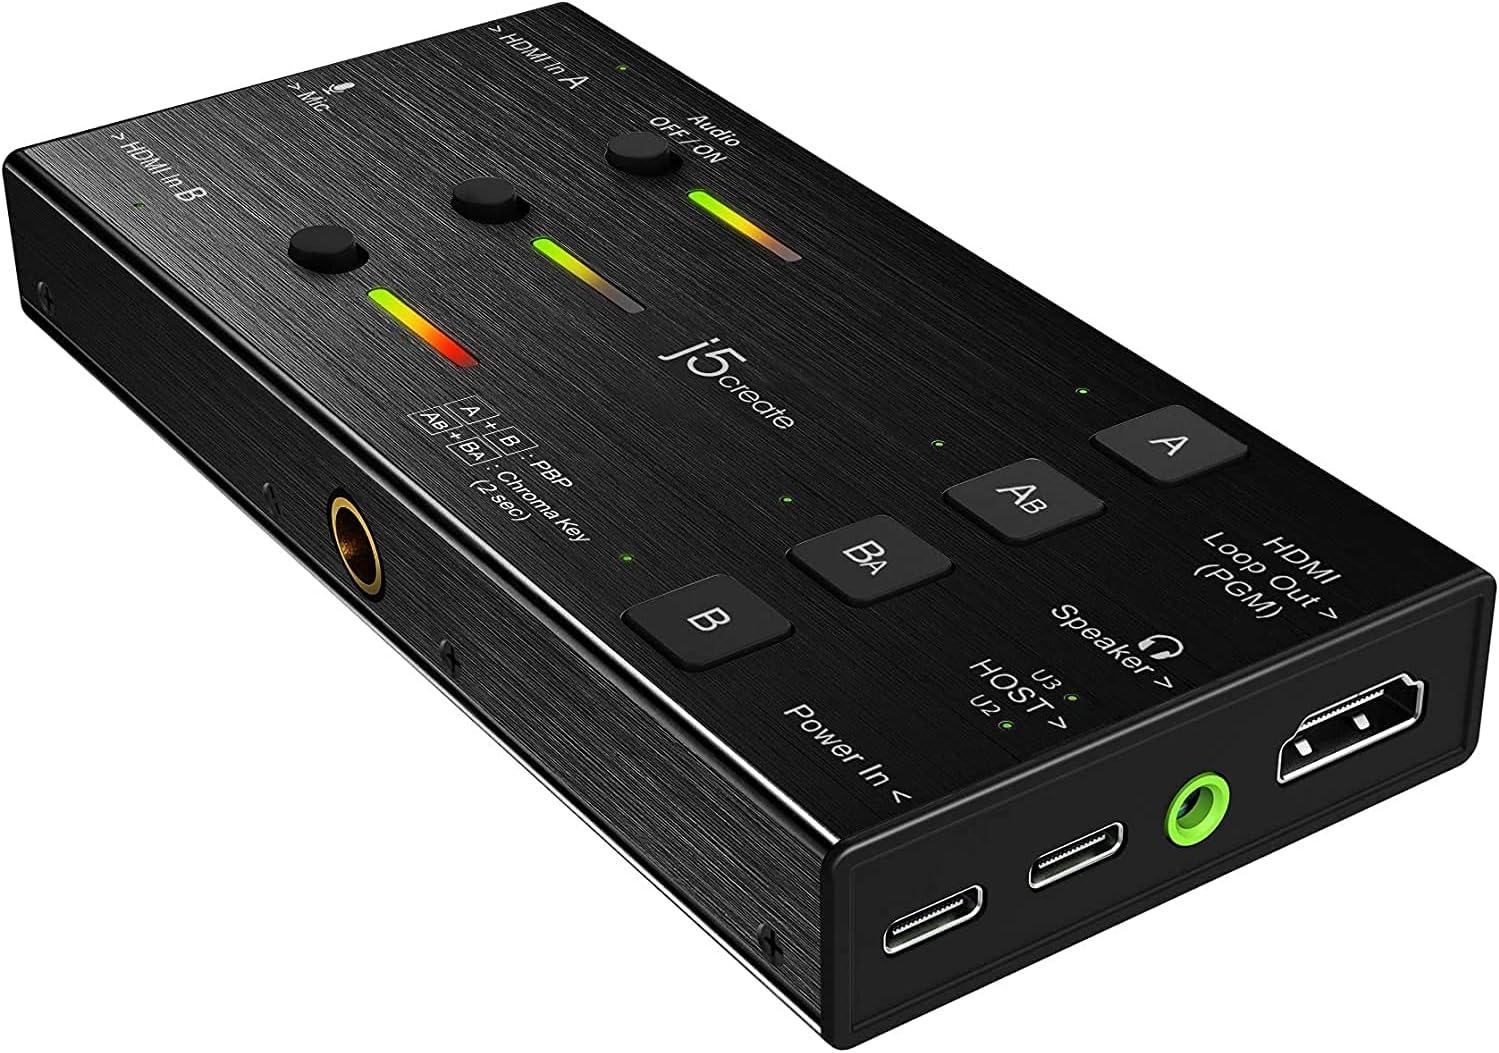 j5create Live security Video Capture Card JVA06- Sale to USB-C Supp Dual HDMI